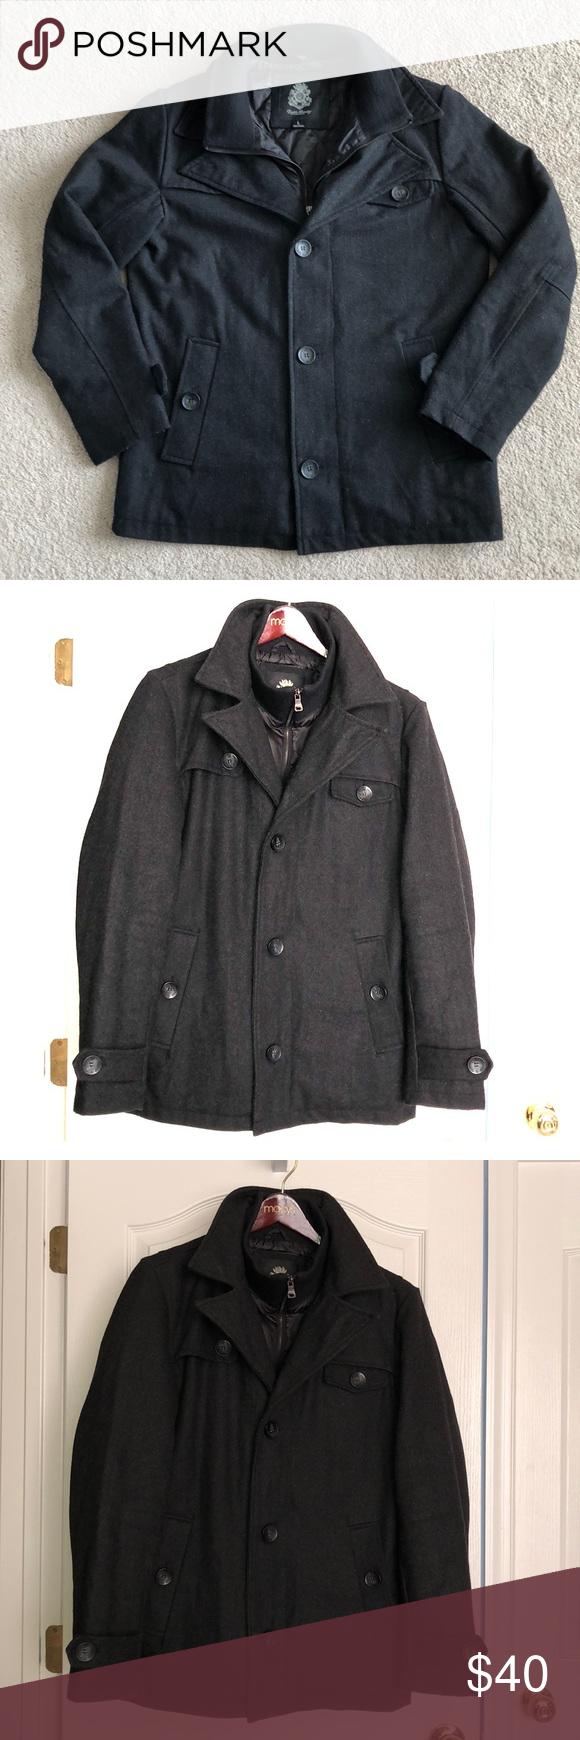 Men S Wool Blend Pea Coat Peacoat Laundry Jackets Wool Blend [ 1740 x 580 Pixel ]